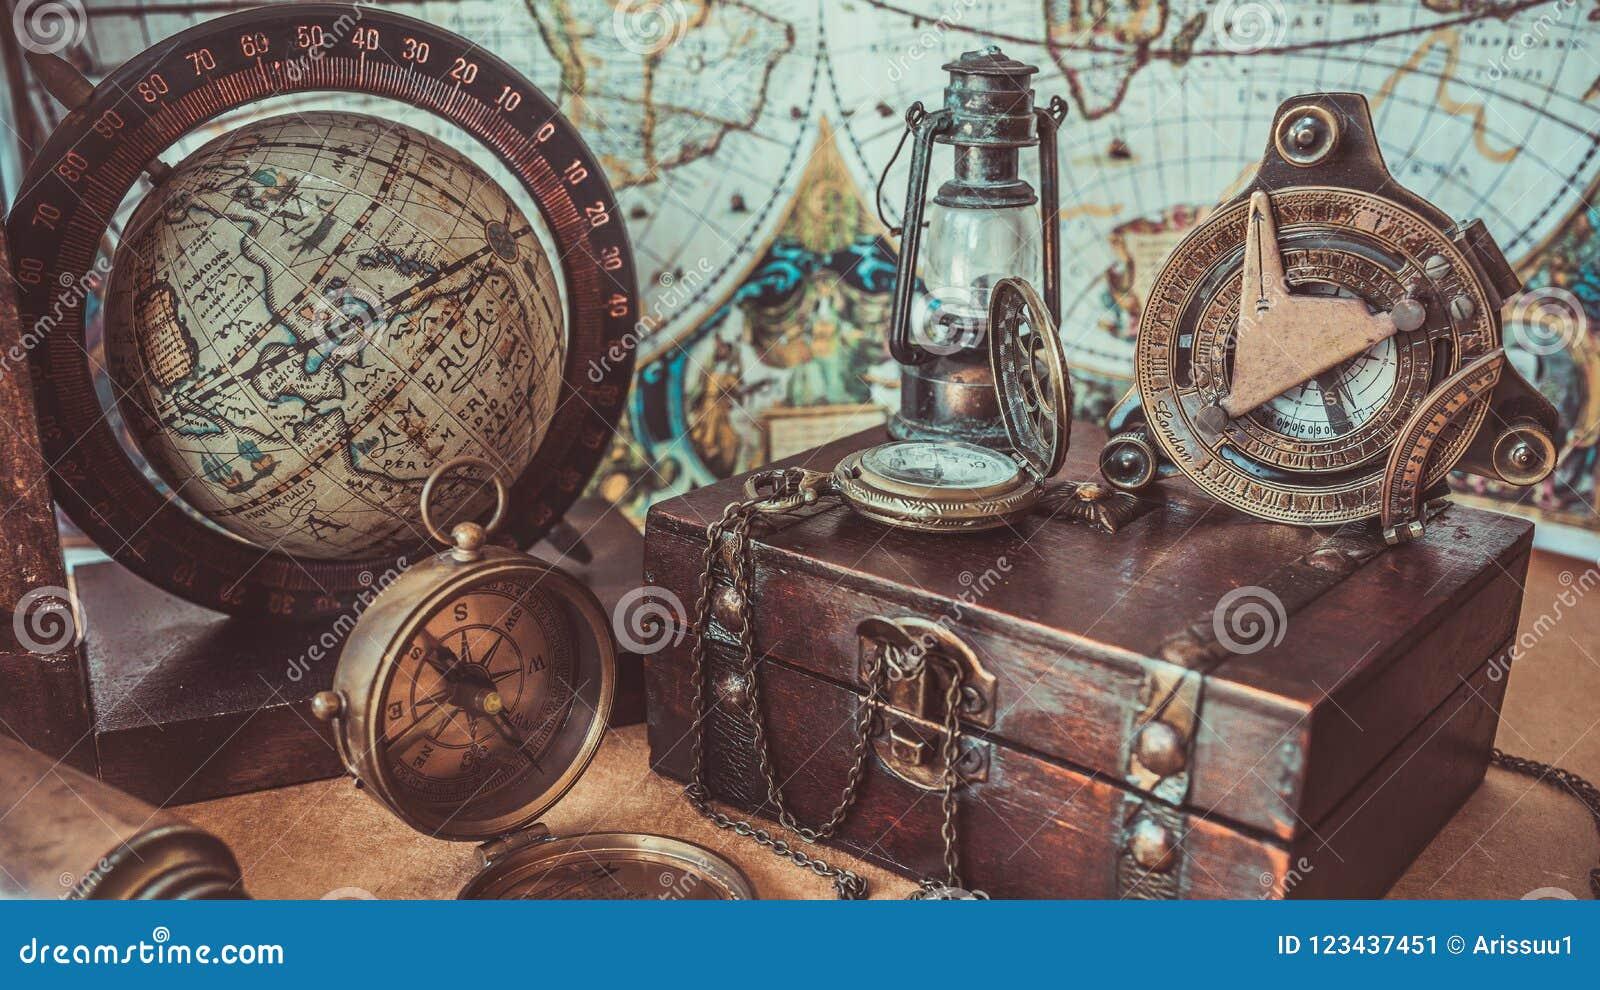 Modelo Lantern Lighting Watch do globo do compasso do vintage e fotos modelo de Maritime Nautical Navigation do globo